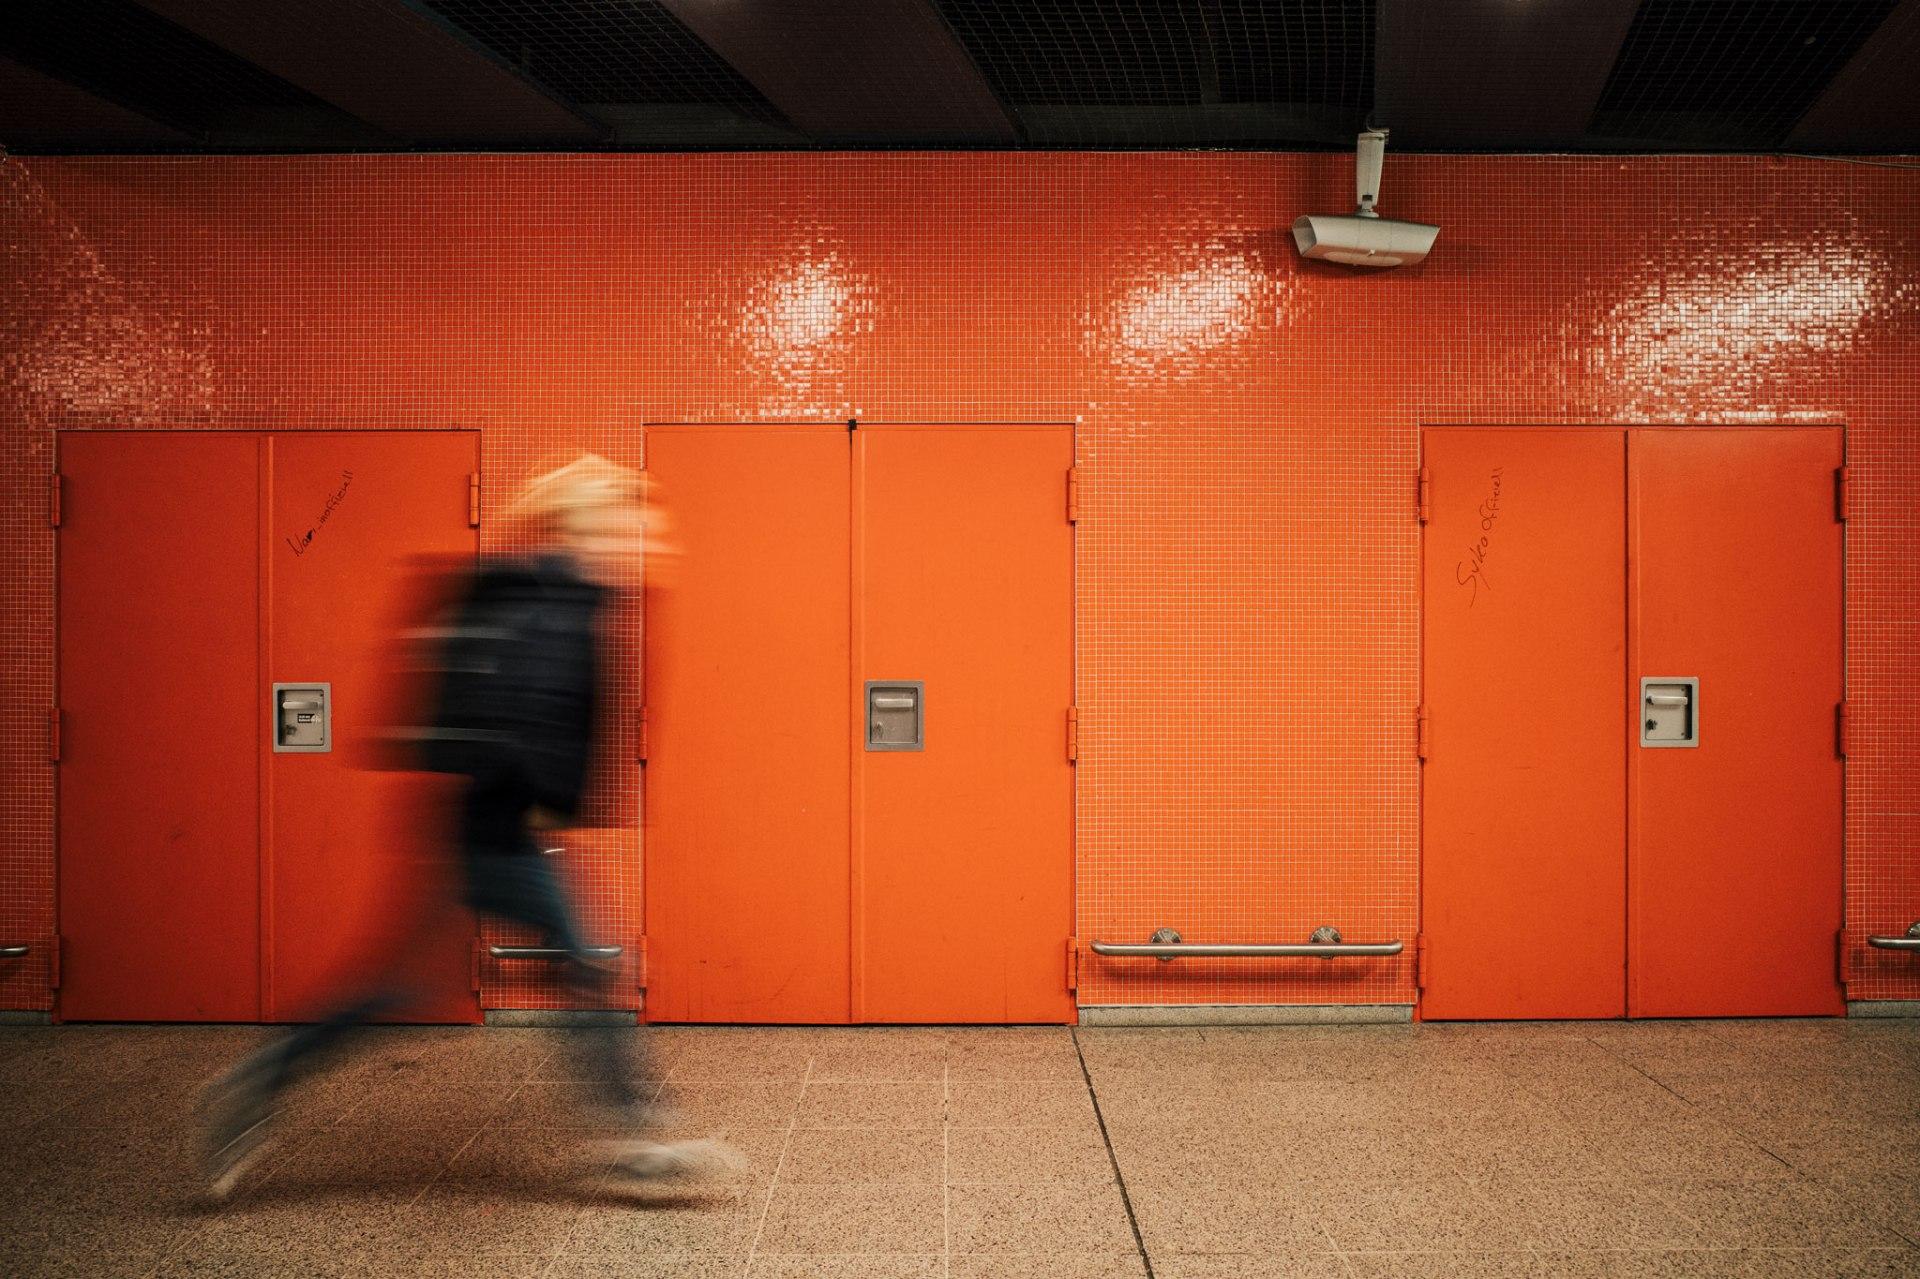 Dissolved in Orange